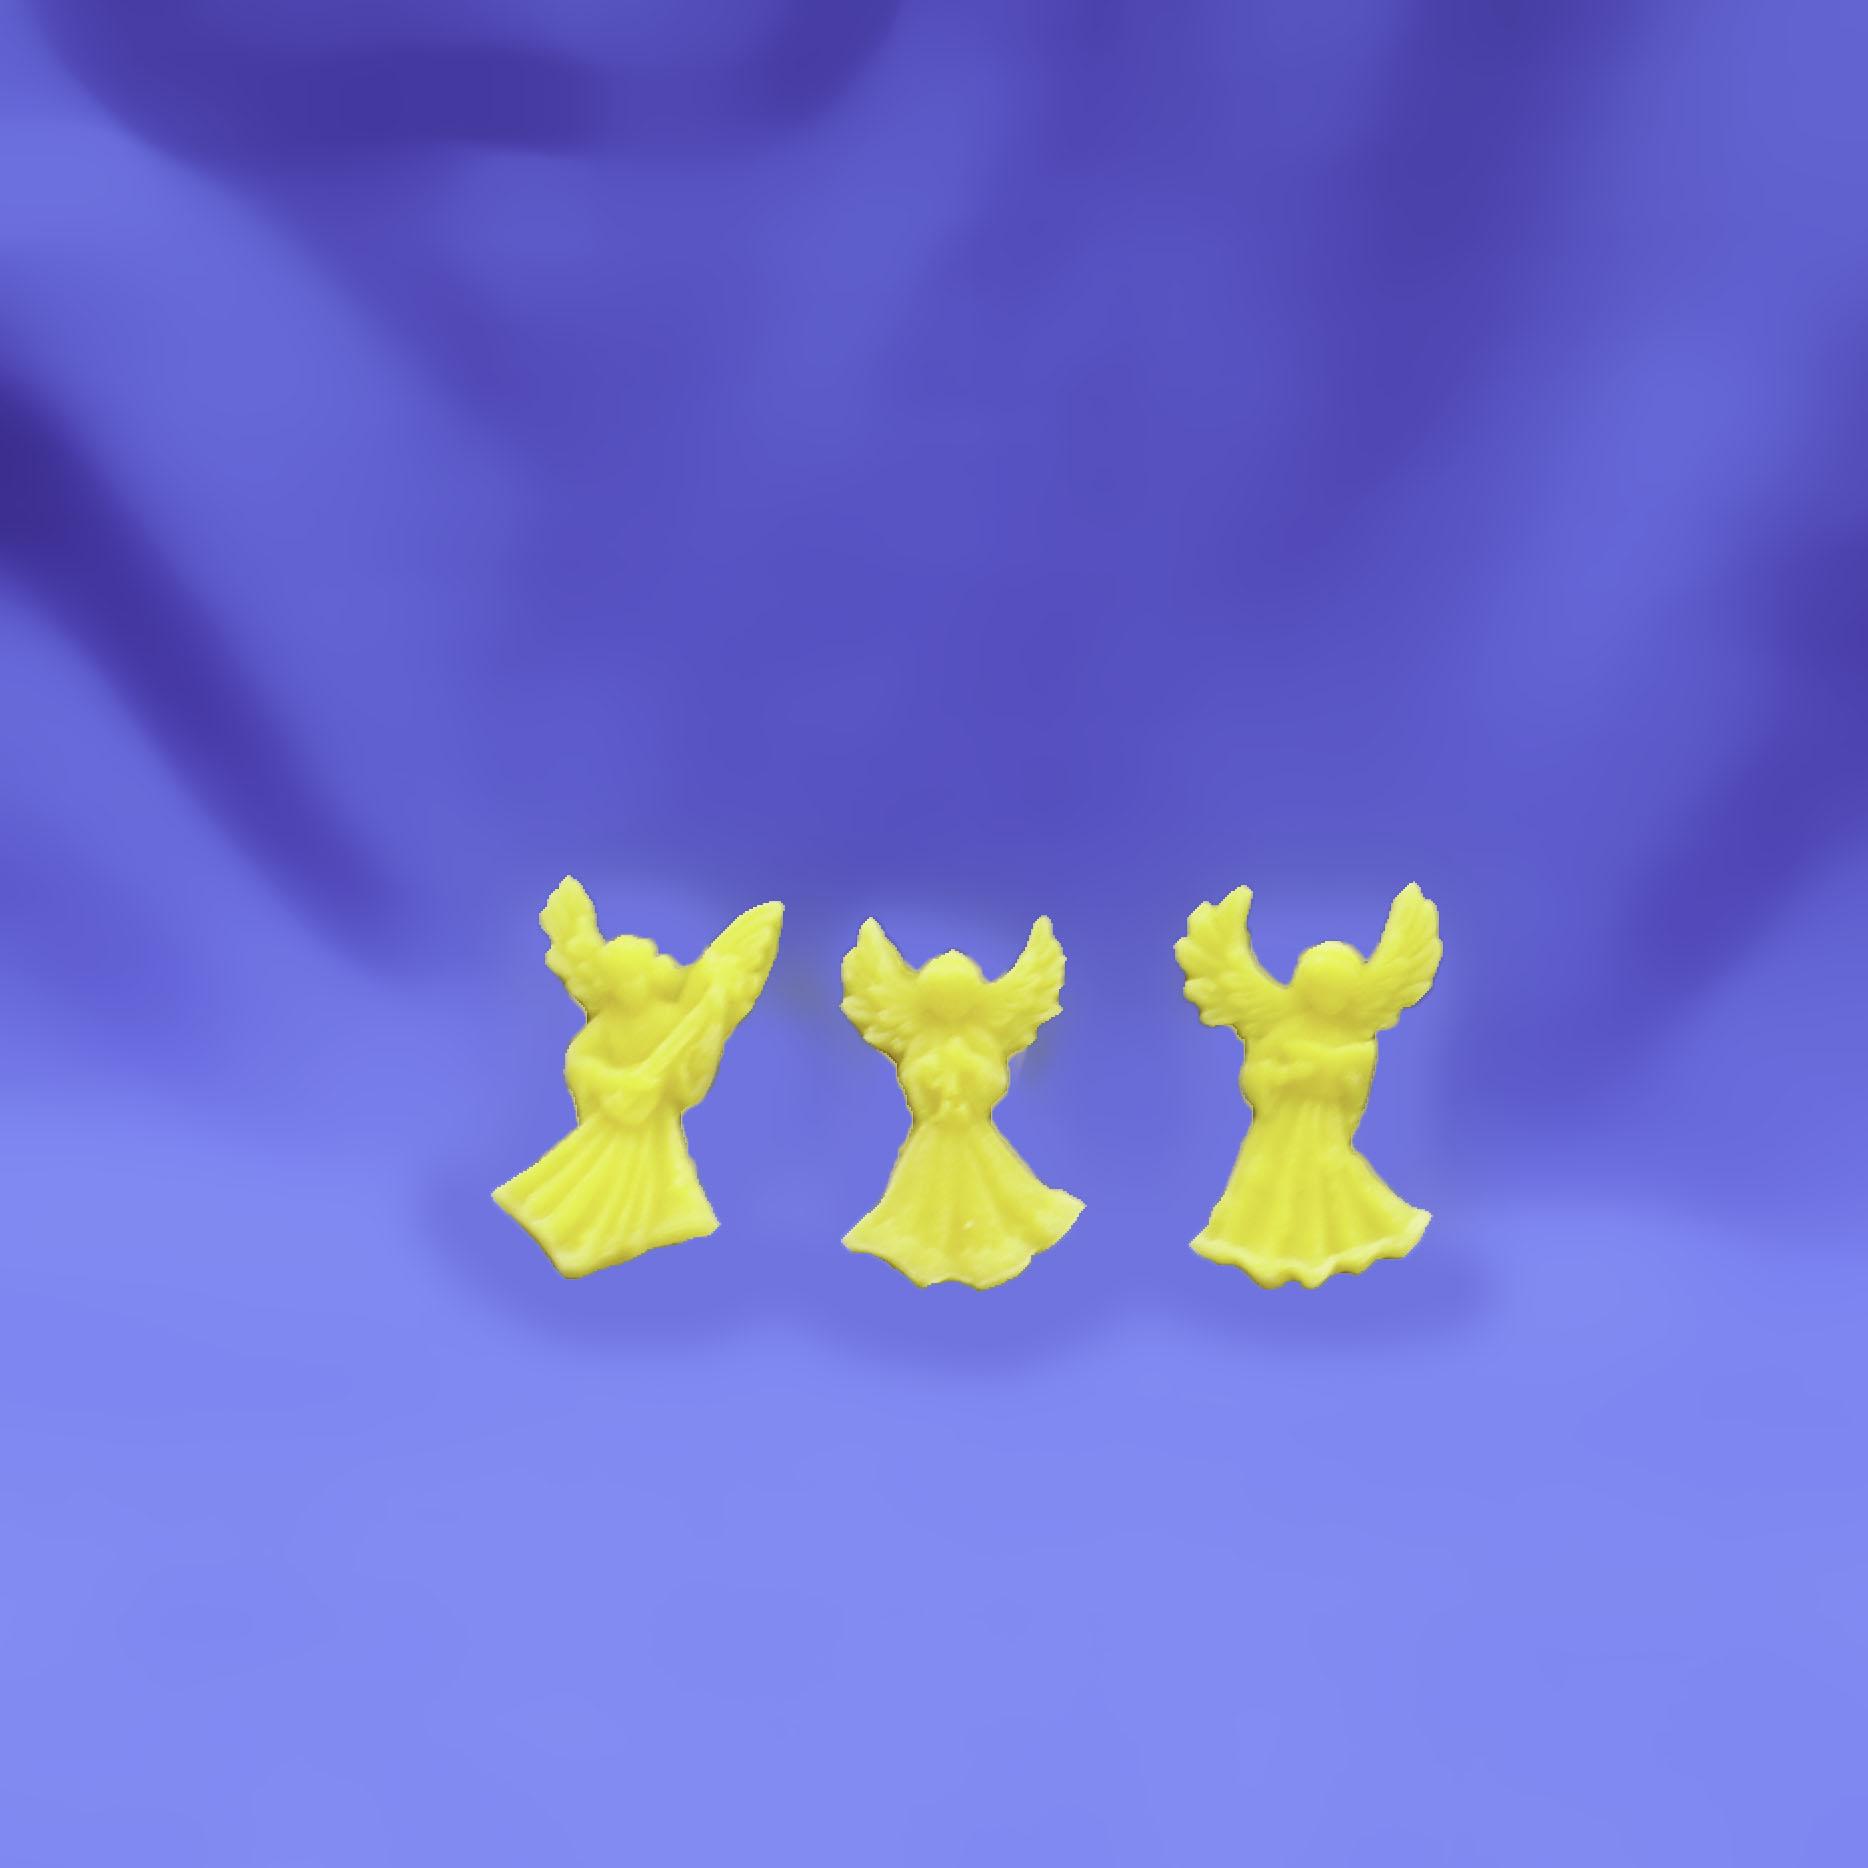 Beeswax Mini Angels Set of 3 Ornaments